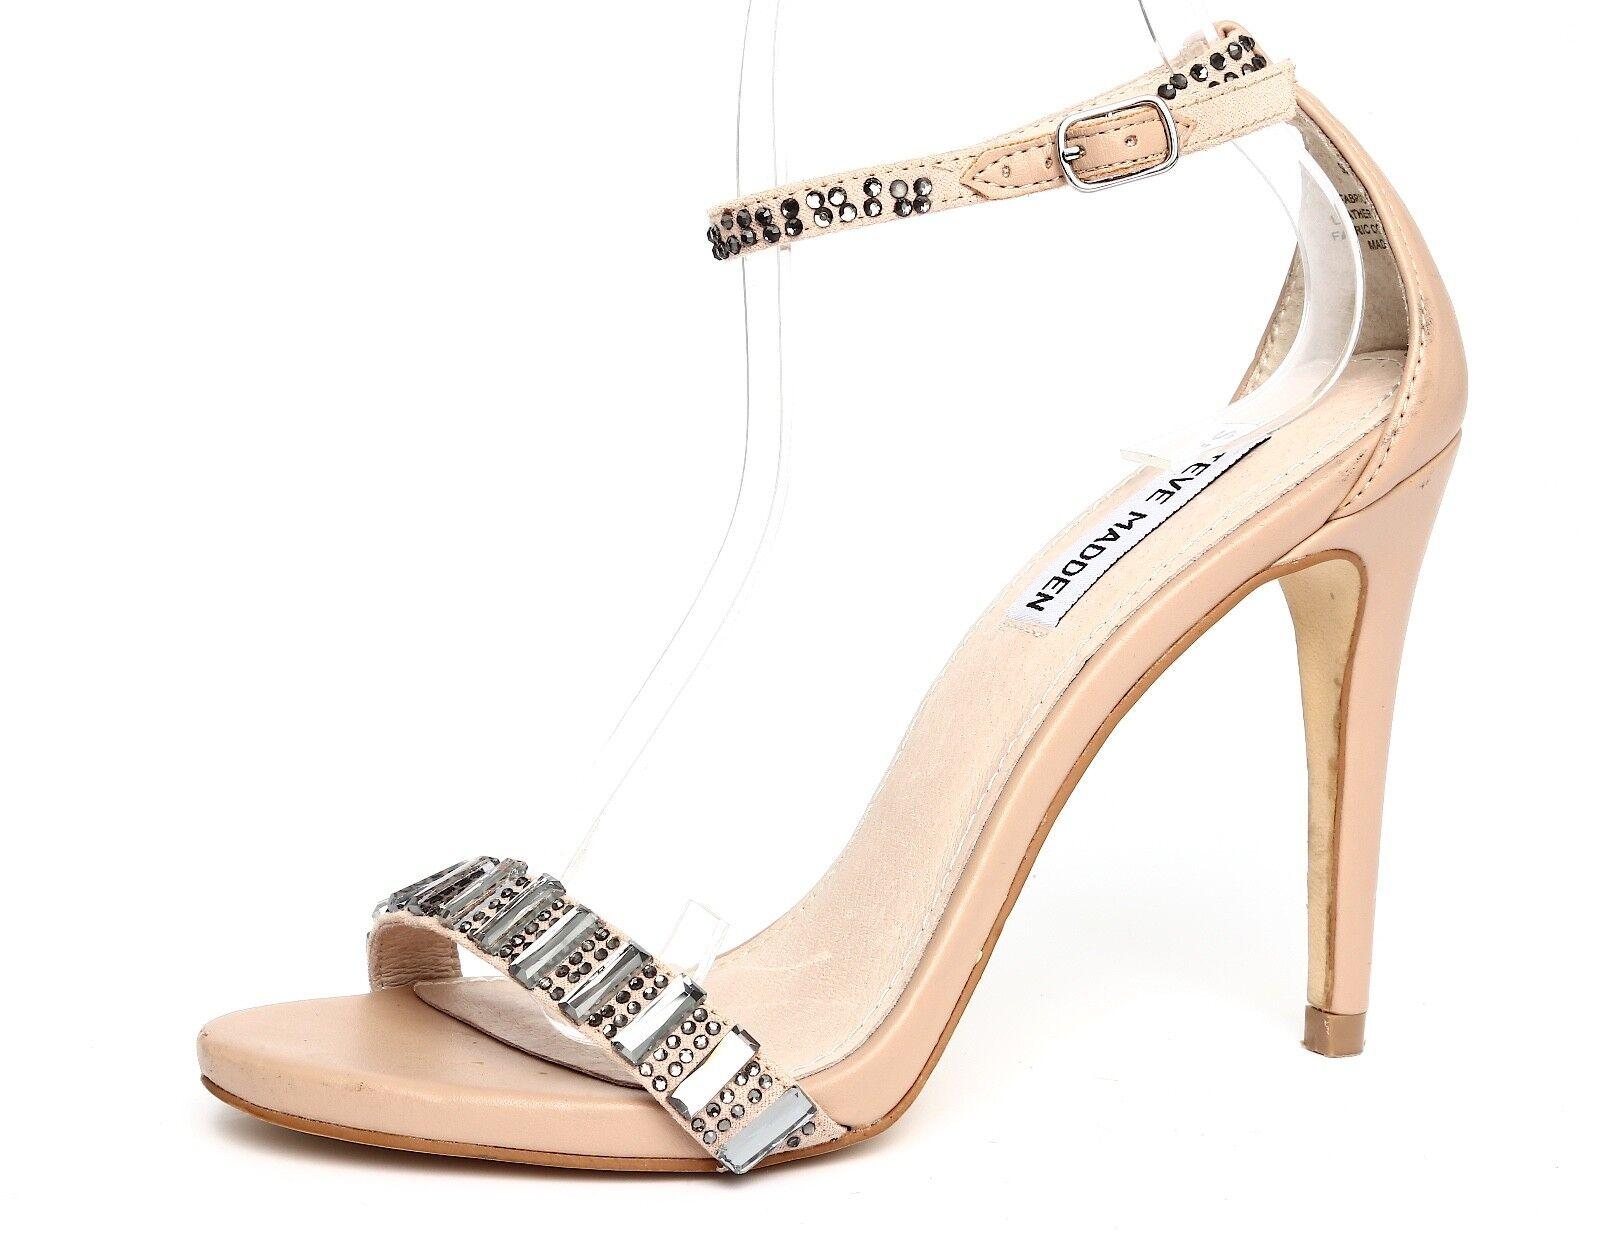 Steve Madden Womens Suzzana Beige Ankle Strap Sandal Heels Sz 7M 4964